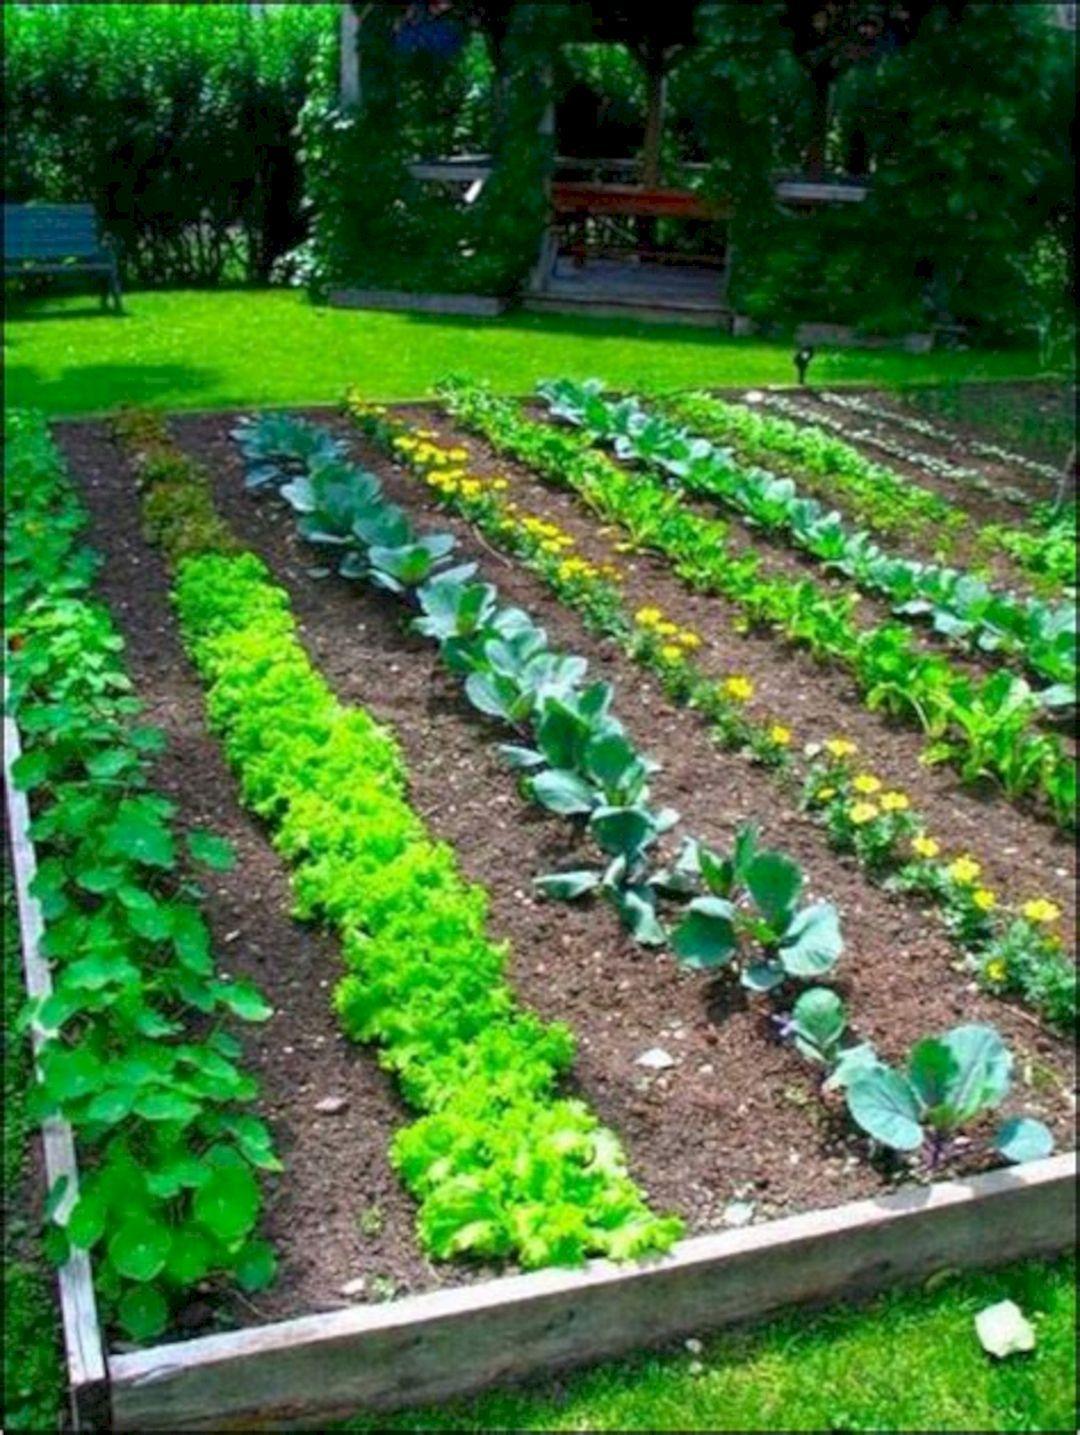 backyard vegetable gardens vegetable garden design veg garden beginner vegetable garden harvest